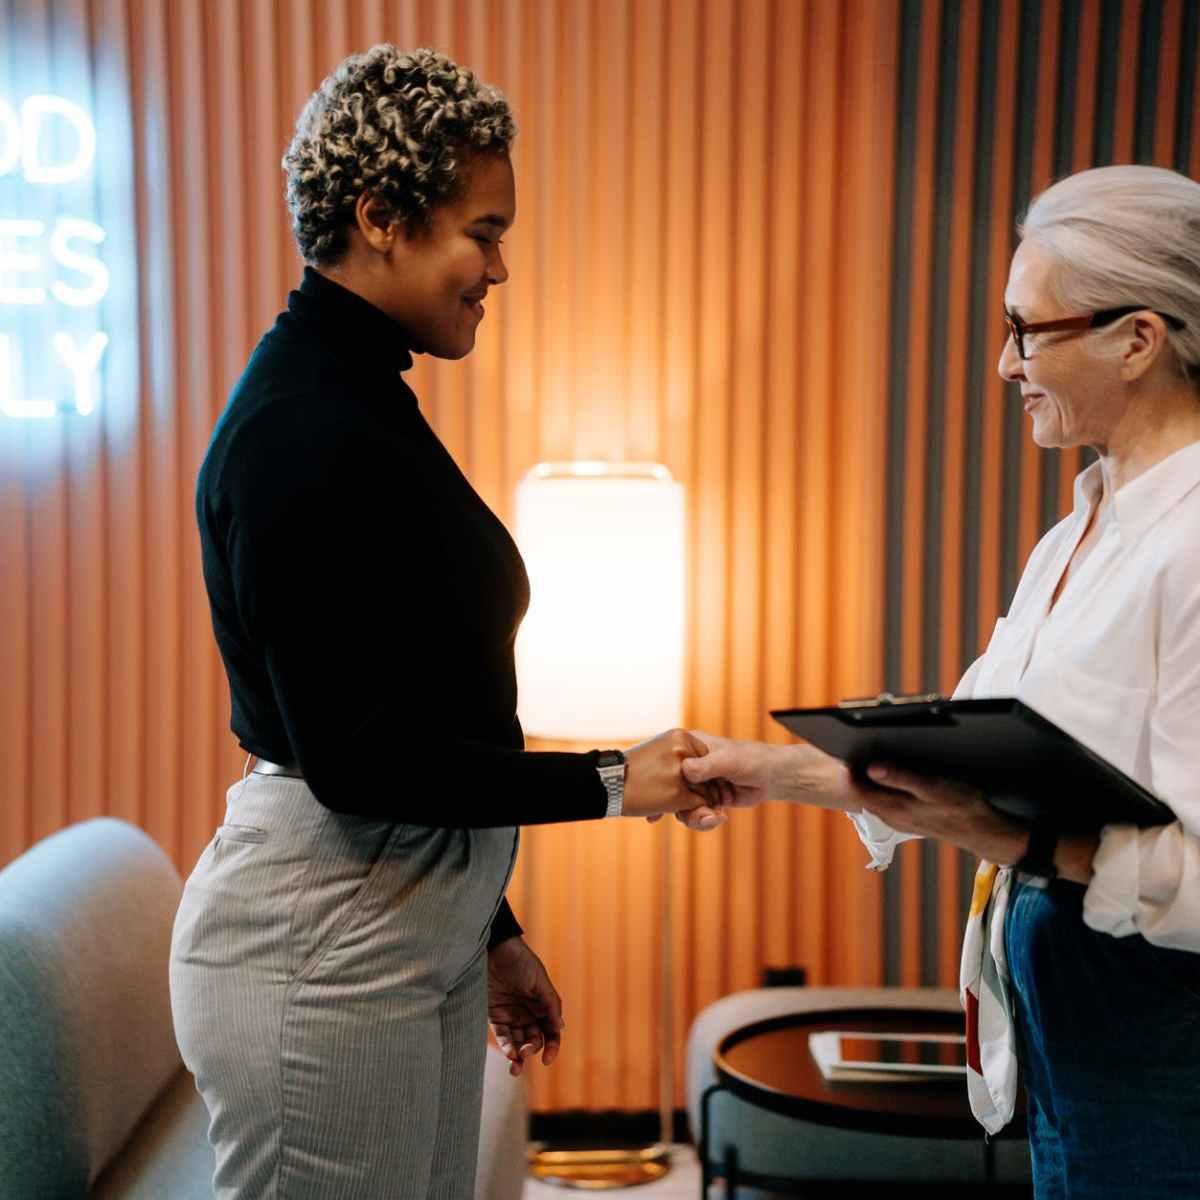 woman in black long sleeve shirt had a job interview